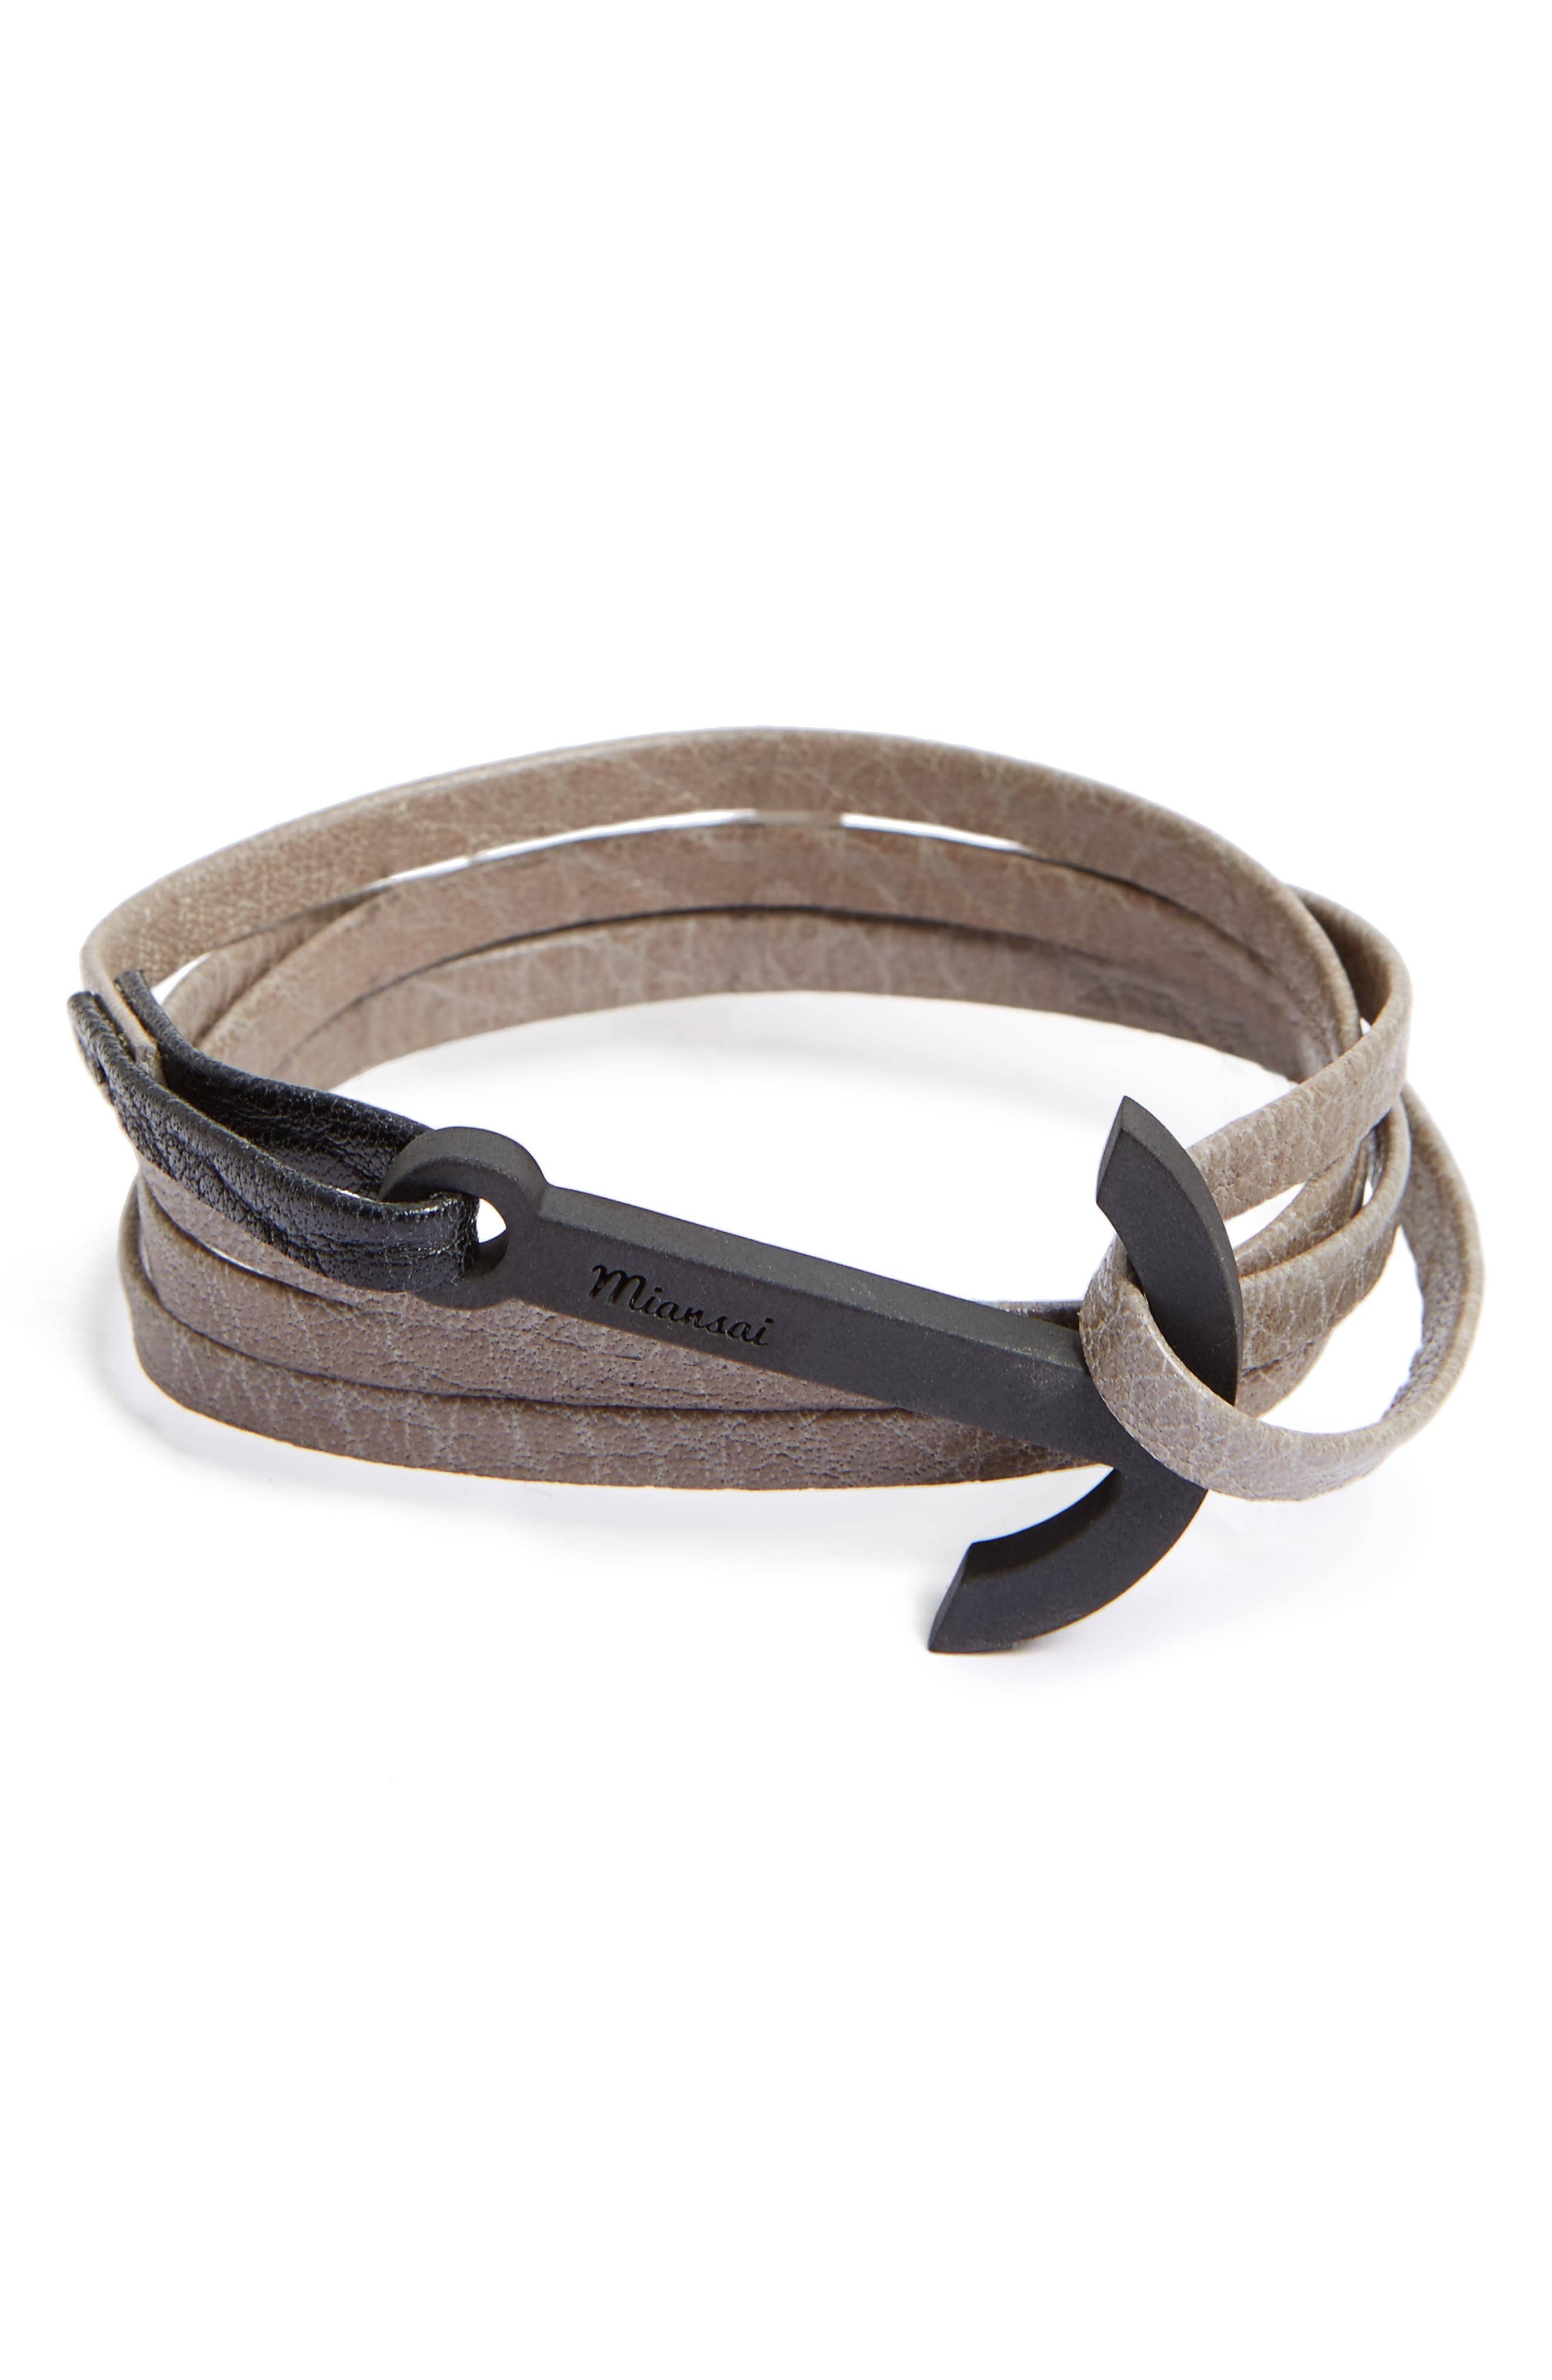 Main Image - Miansai Modern Anchor Leather Wrap Bracelet